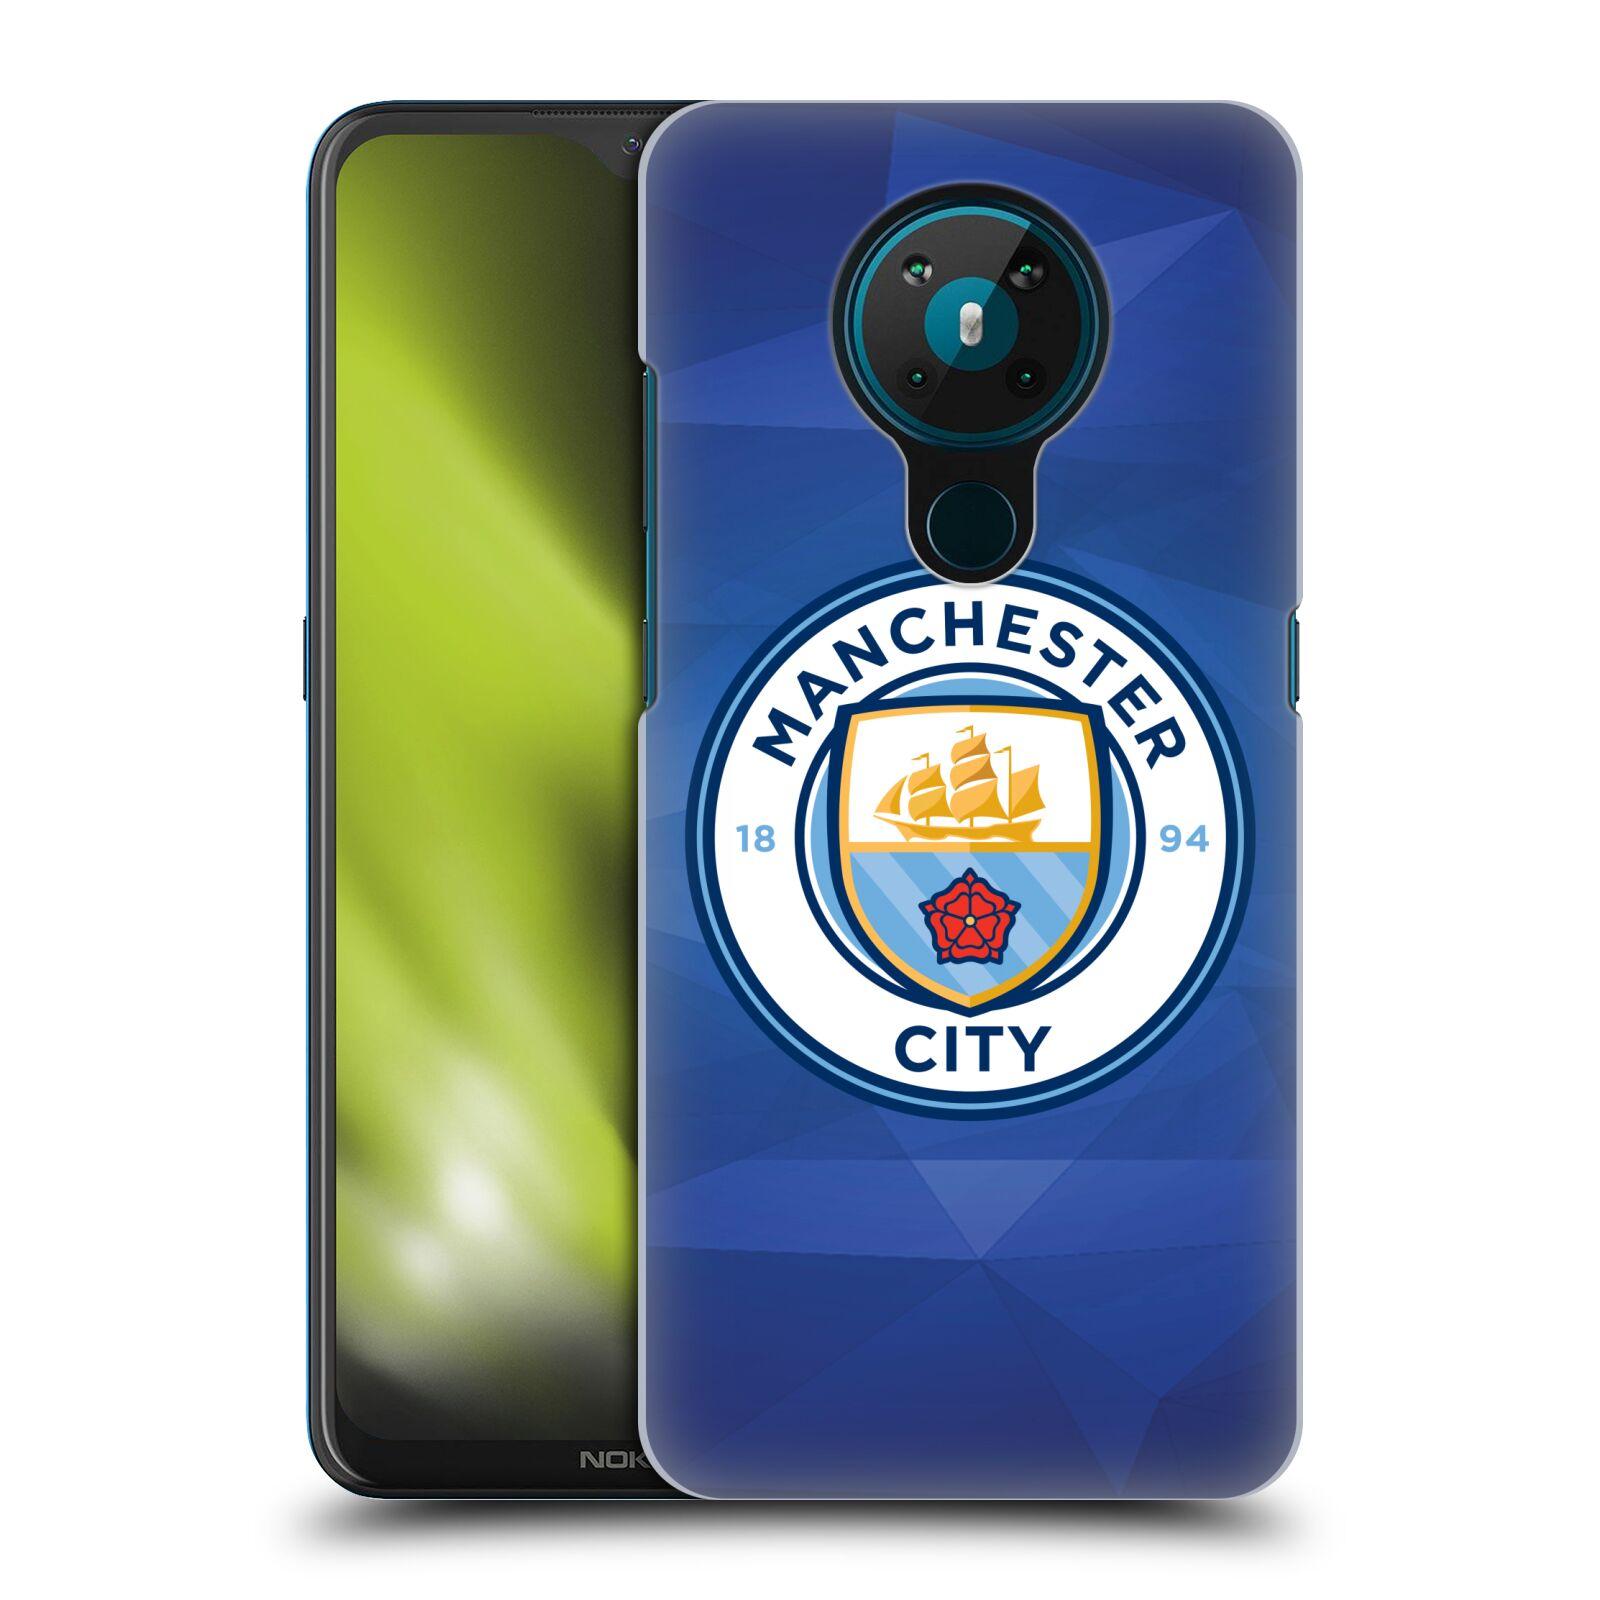 Plastové pouzdro na mobil Nokia 5.3 - Head Case - Manchester City FC - Modré nové logo